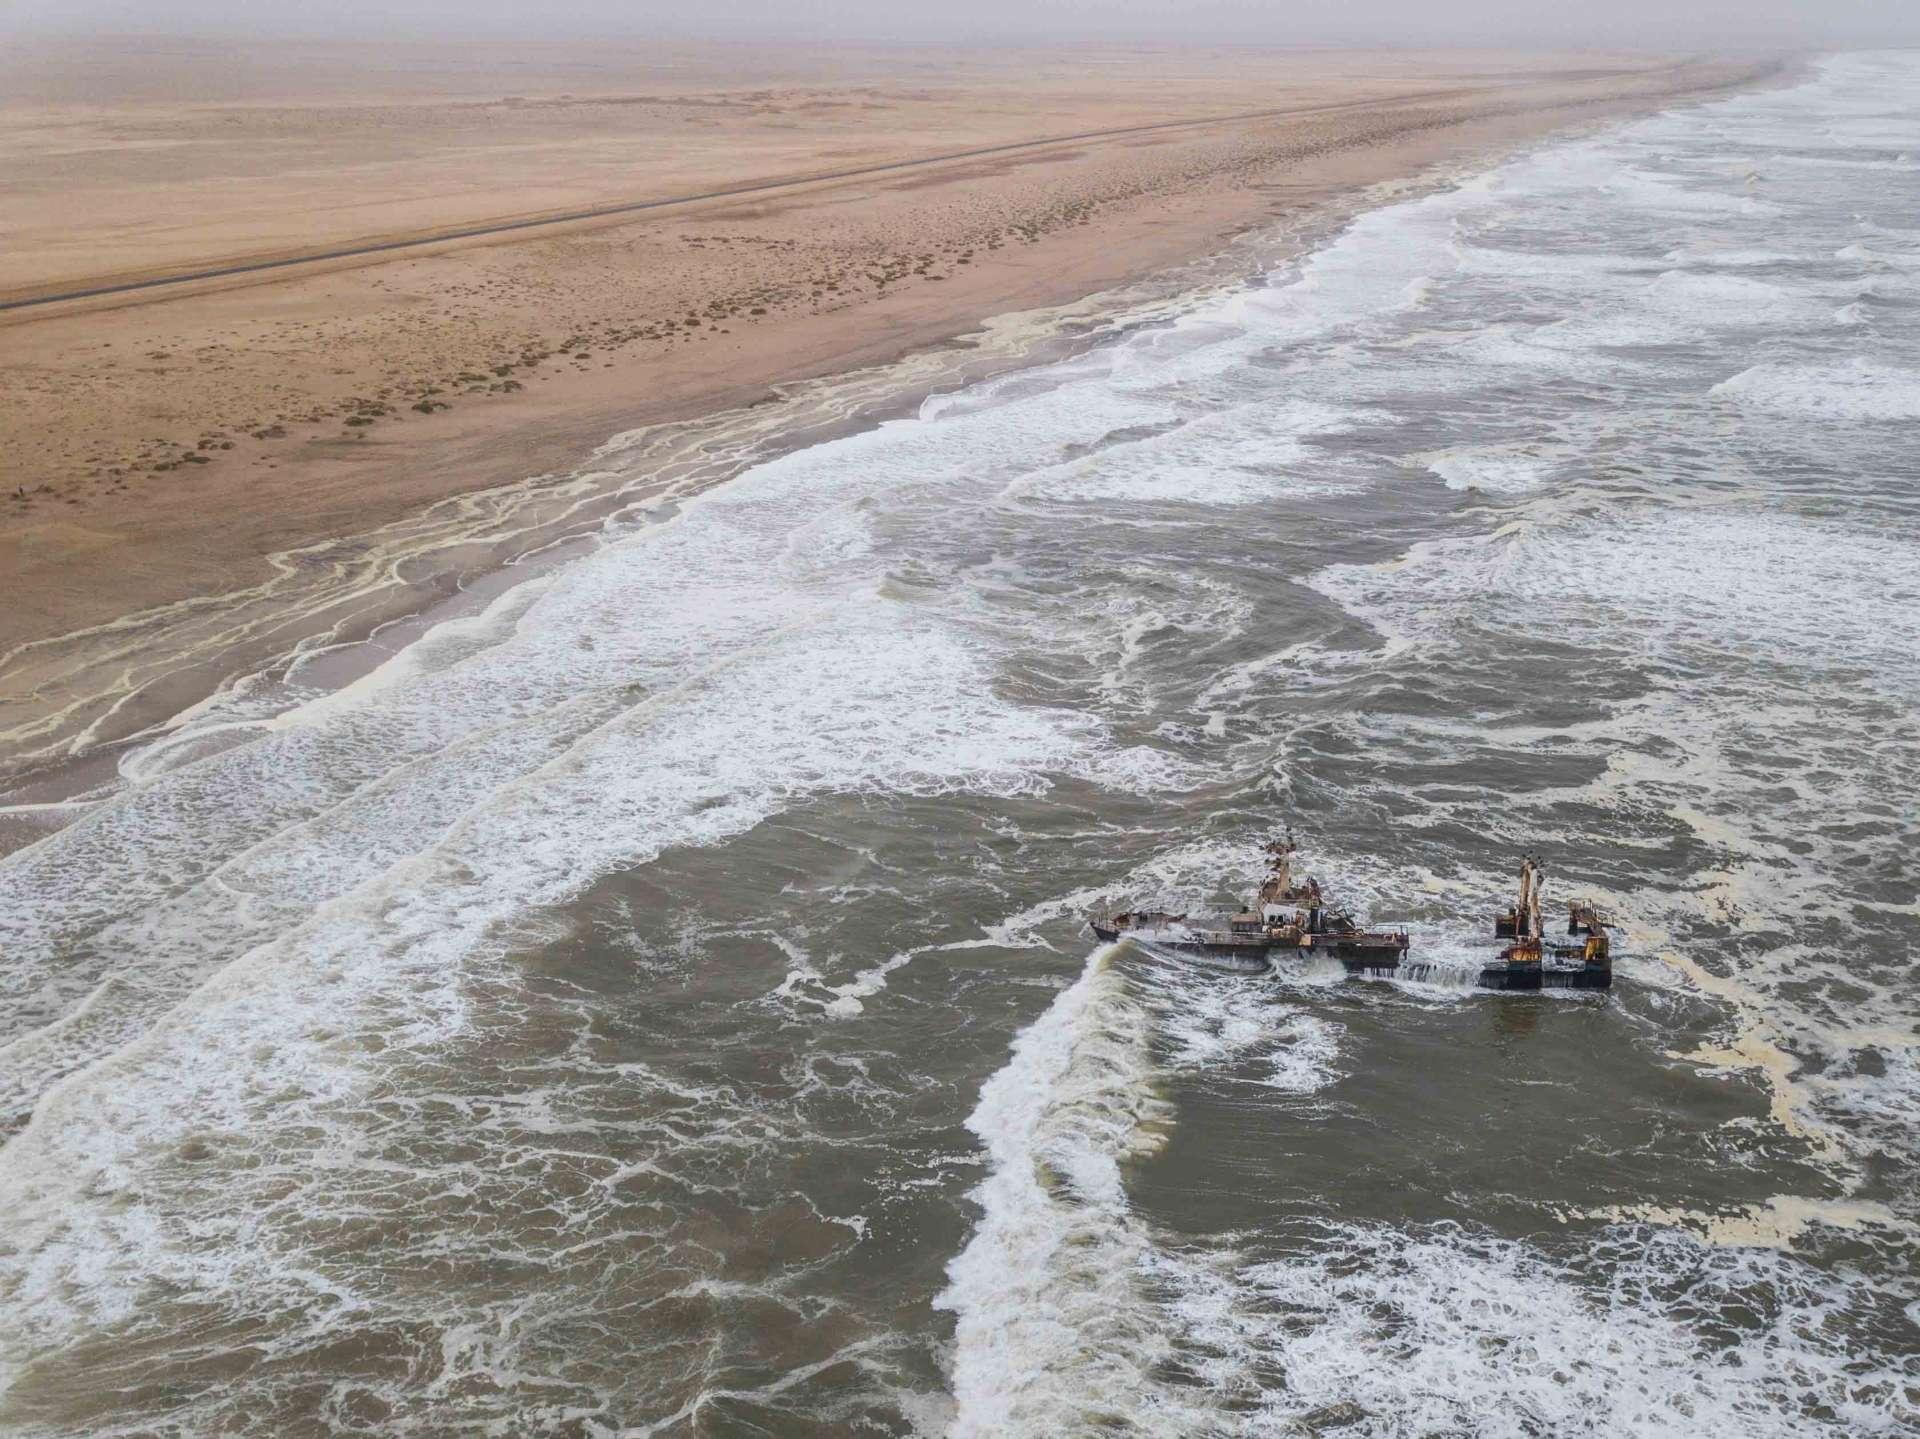 Namibia Enrico Pescantini Travel Photographer drone aerial from above skeleton coast shipwreck